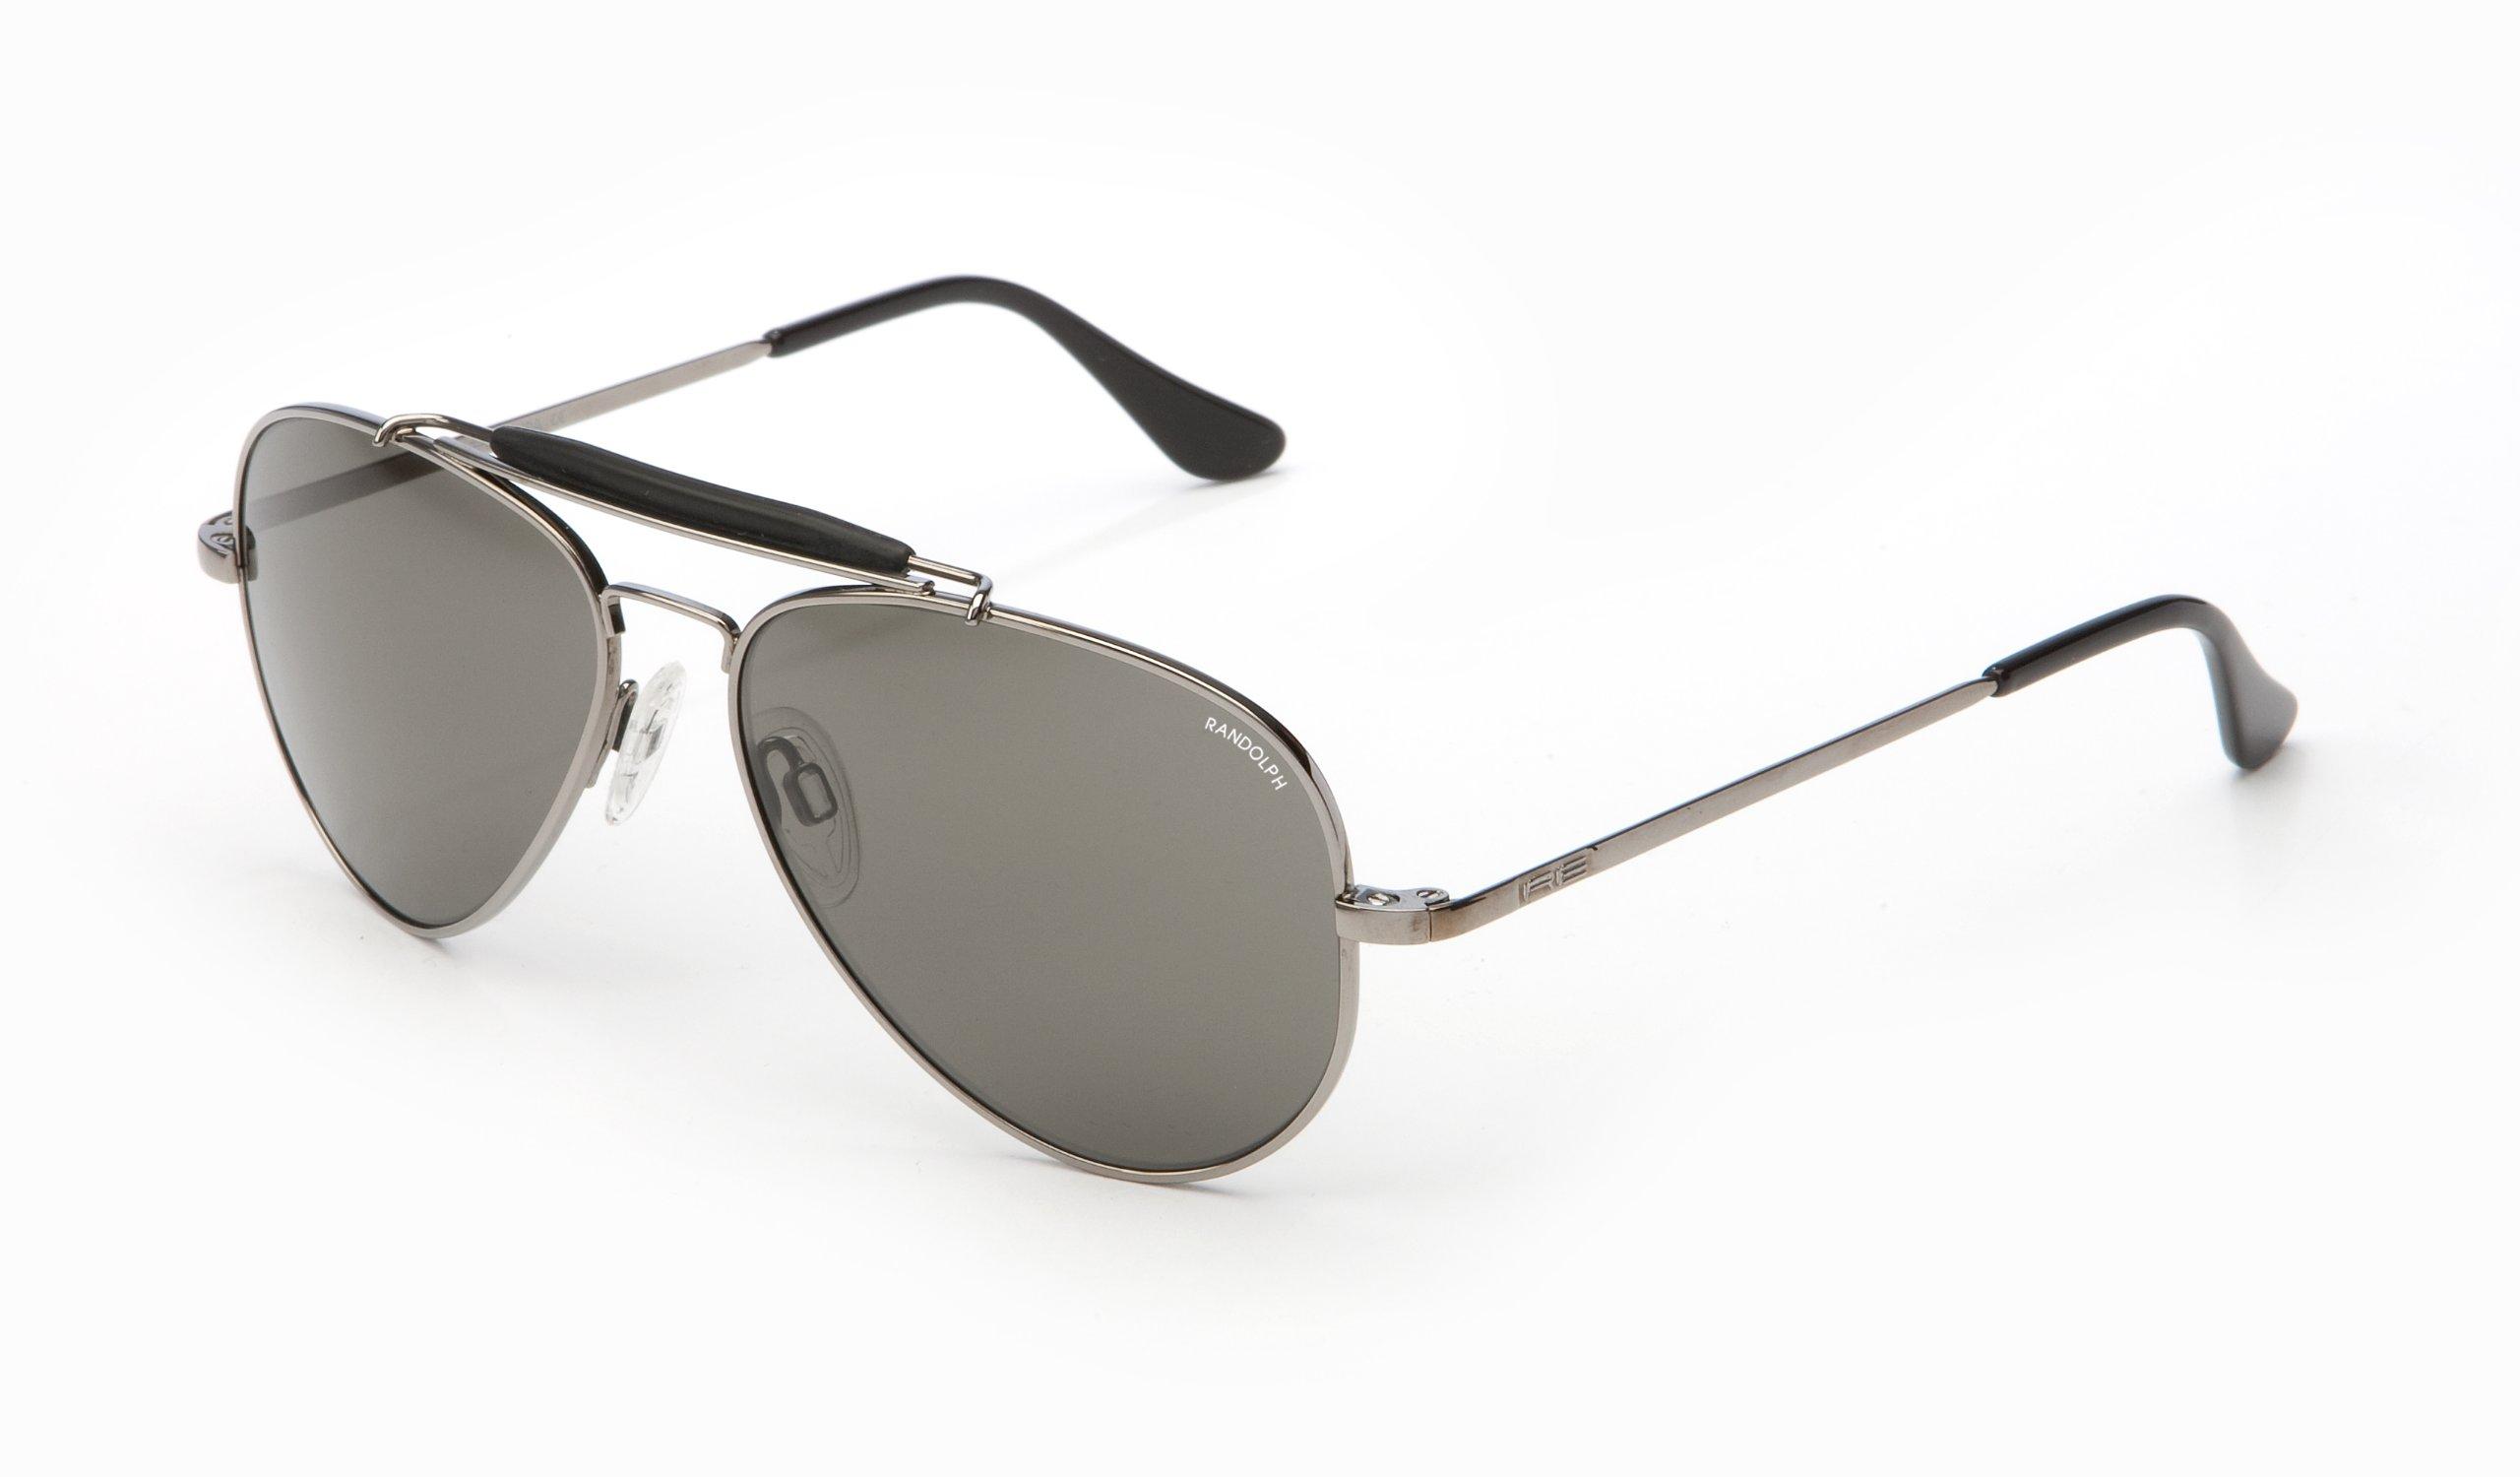 Randolph Sportsman Sunglasses Gun Metal / Skull / Gray Glass 57mm